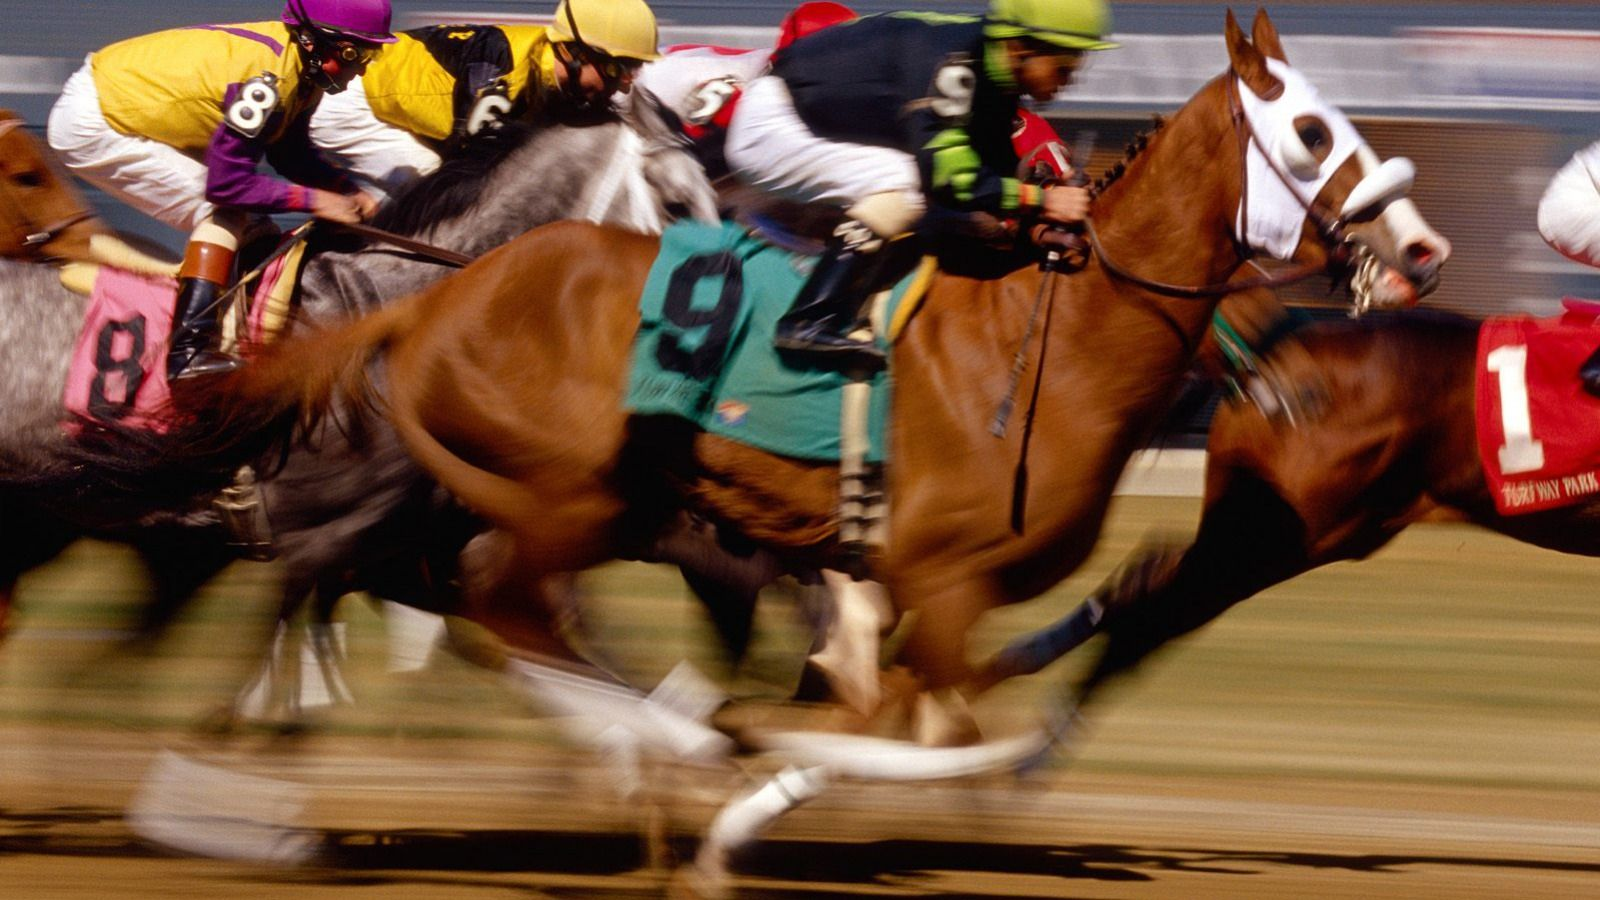 Thoroughbred Horse Racing Turfway Park, Kentucky Équestre